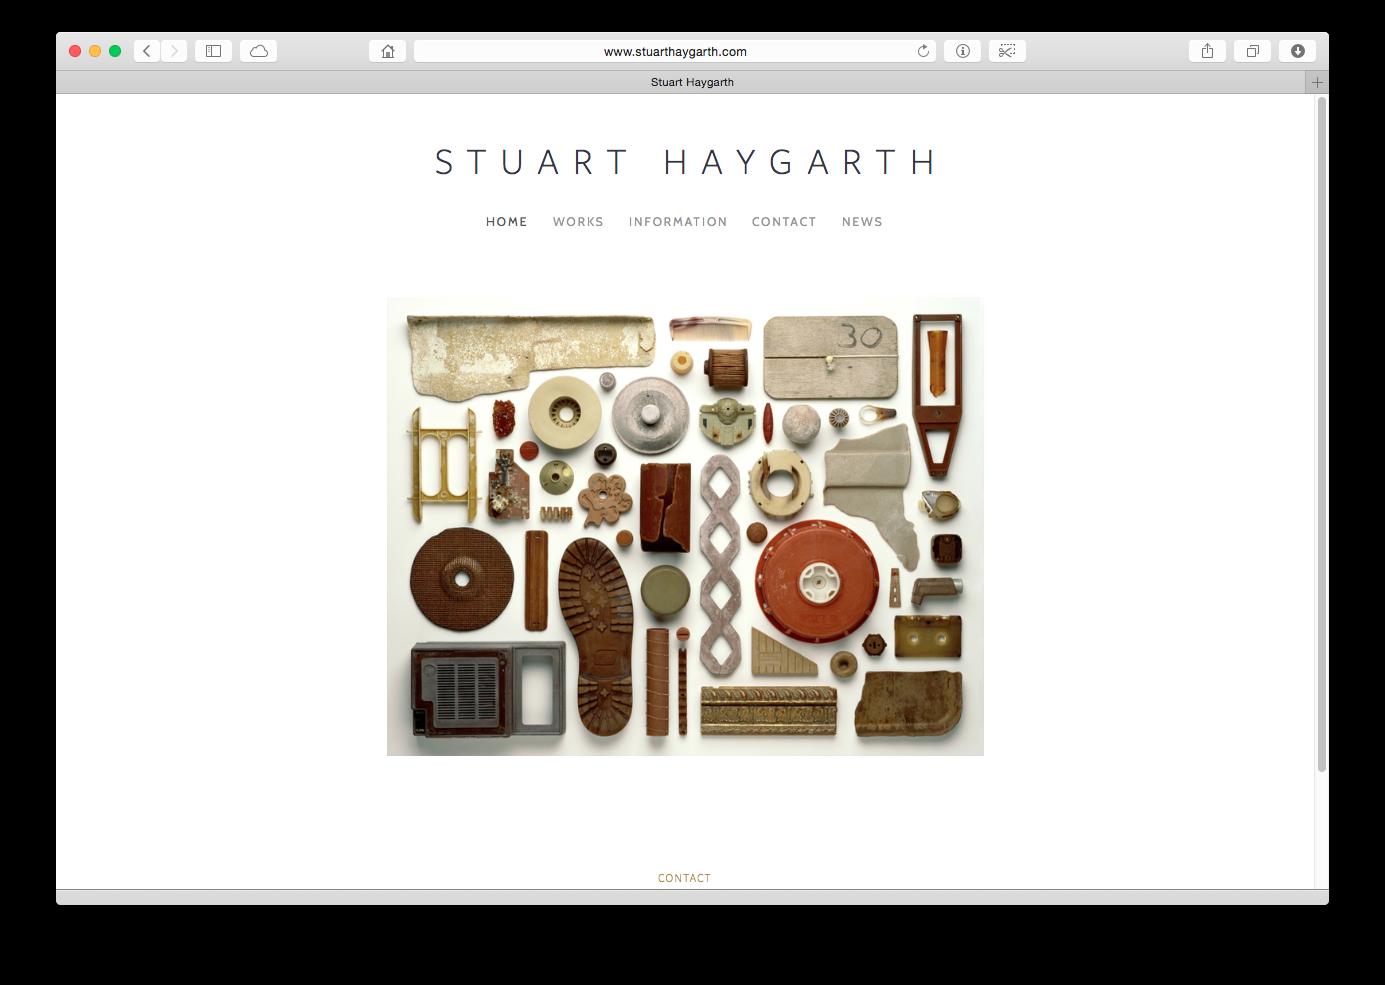 Stuart Haygarth